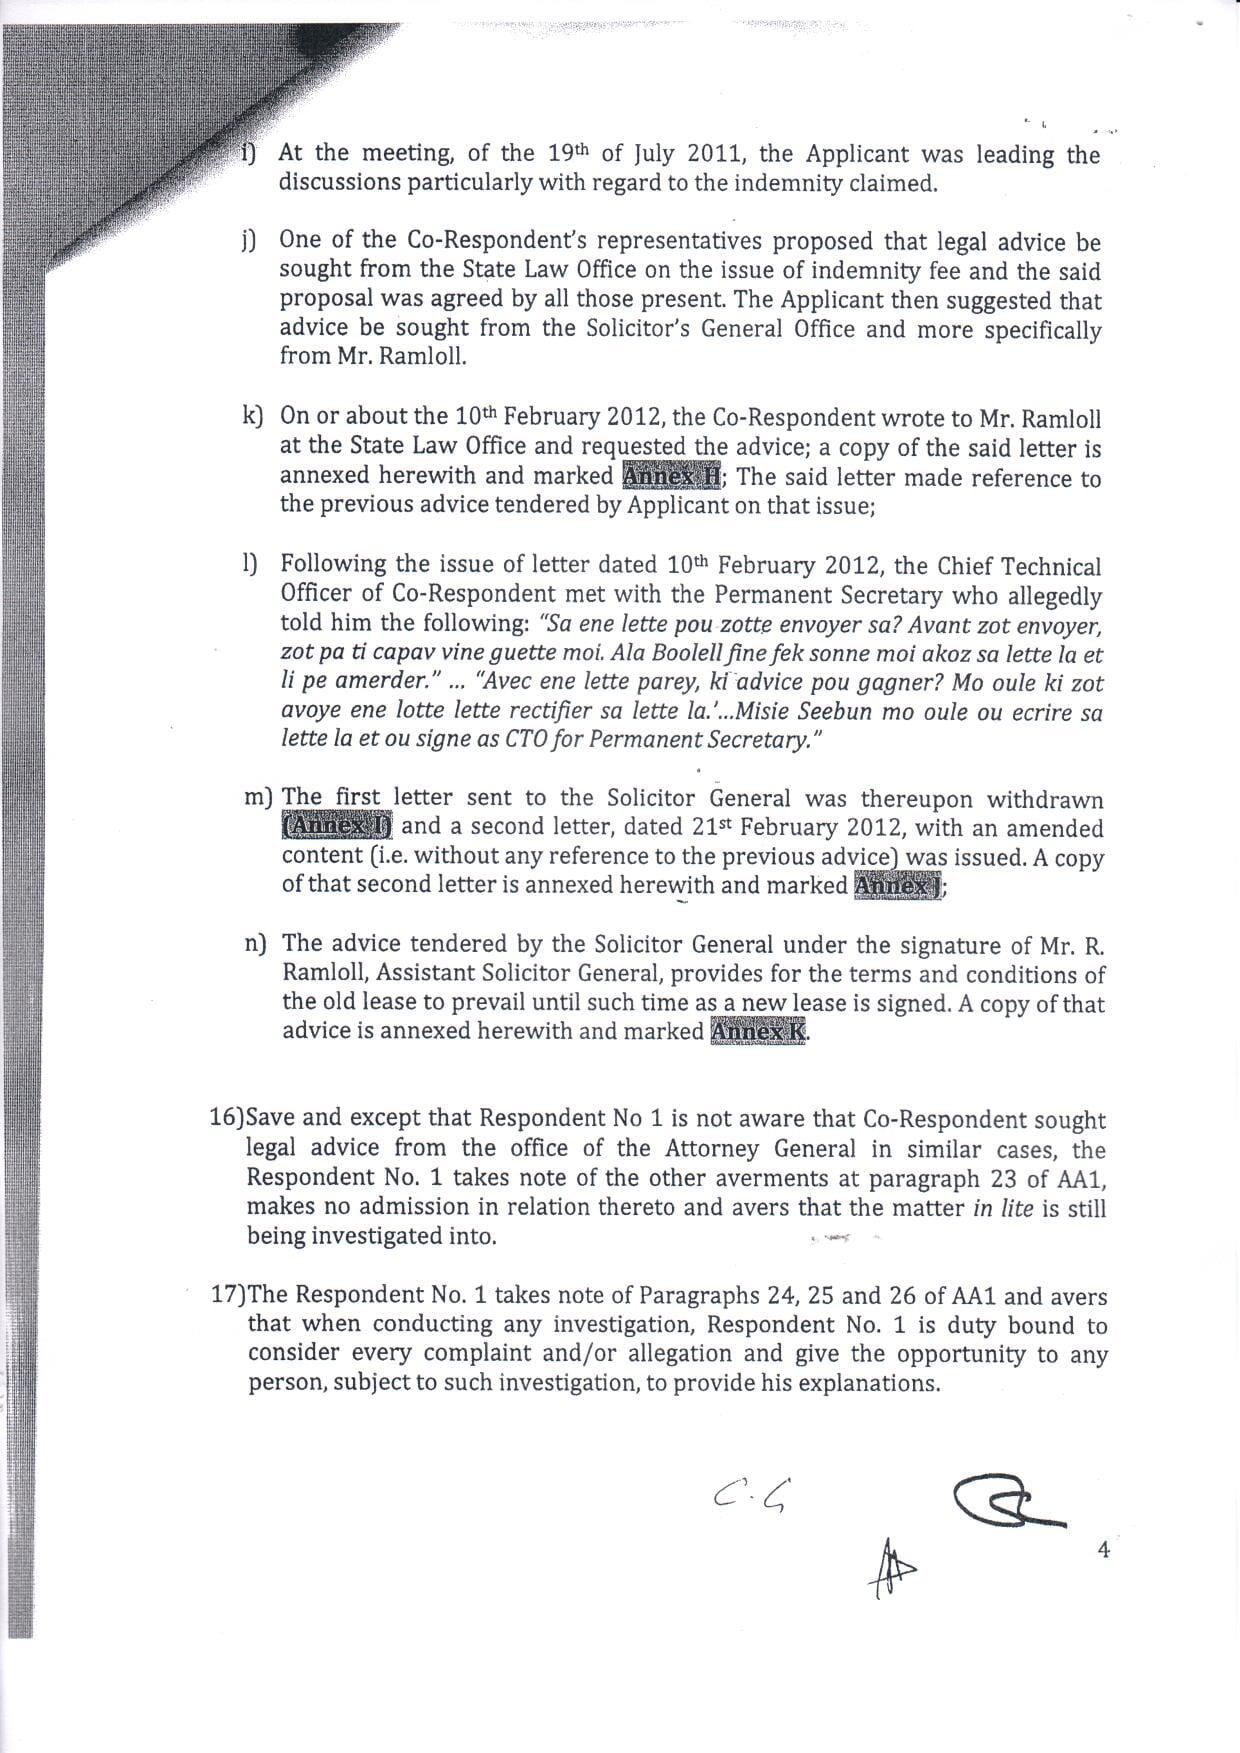 affidavit ICAC boolell 04